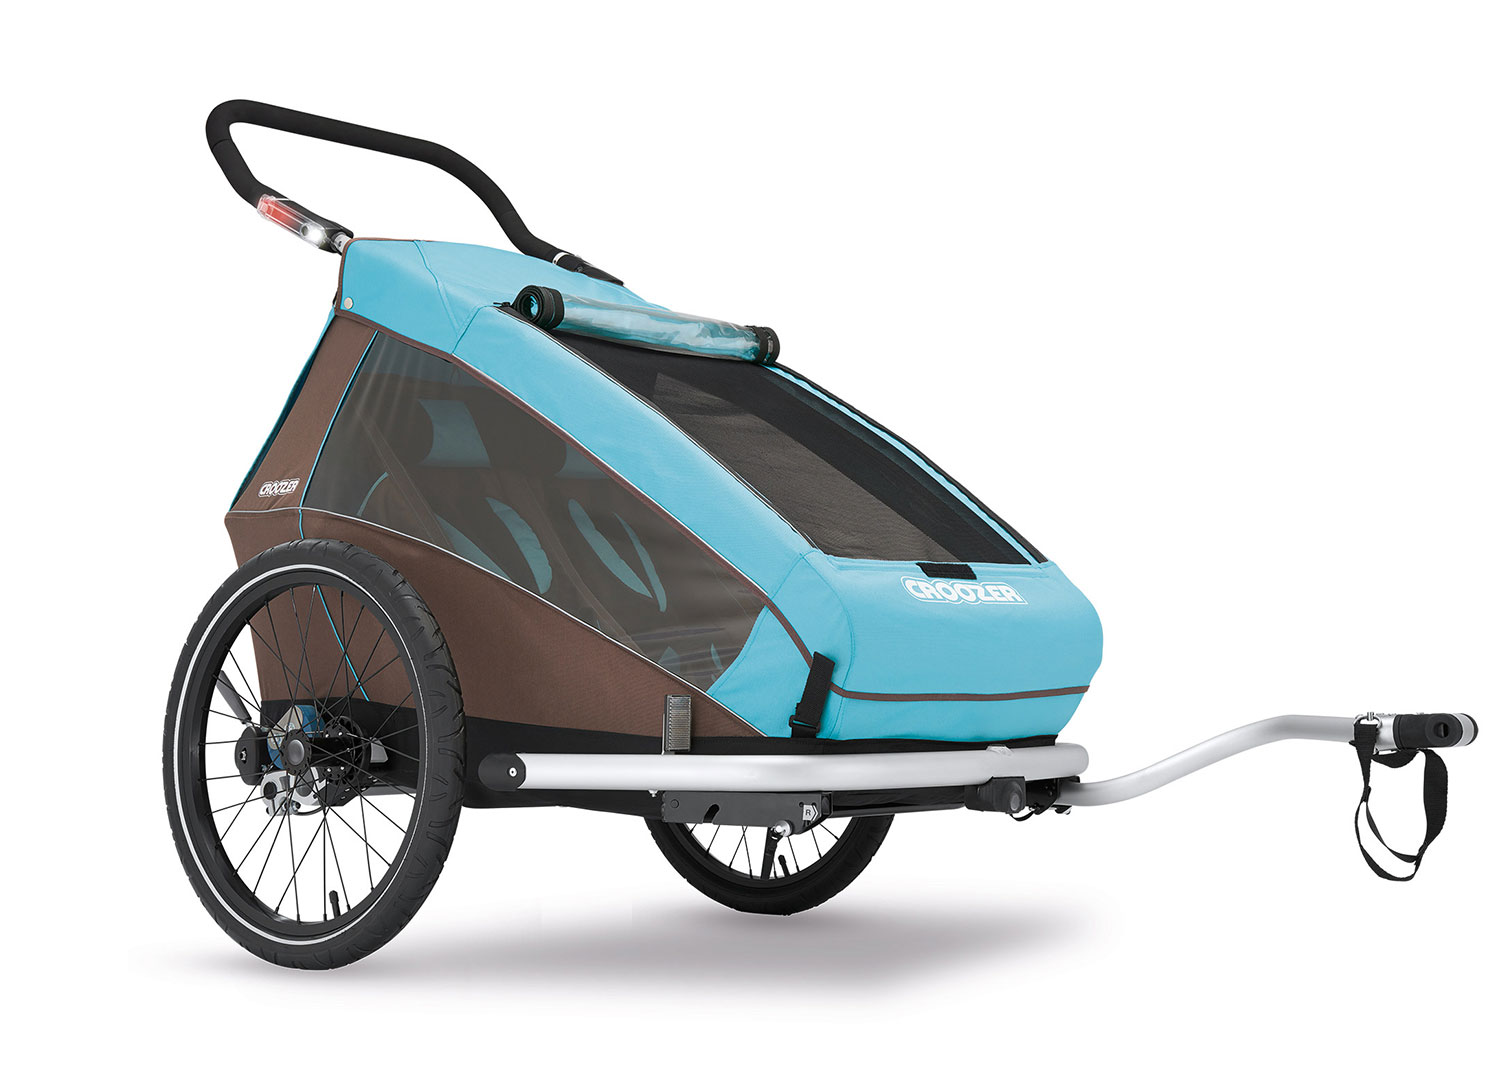 CROOZER KID FOR 2 PLUS Click & Crooz, 2016 - ZDARMA dopravné (Cyklovozík CROOZER KID FOR 2 PLUS Click & Crooz, model 2016, barva modrá, odpružený)